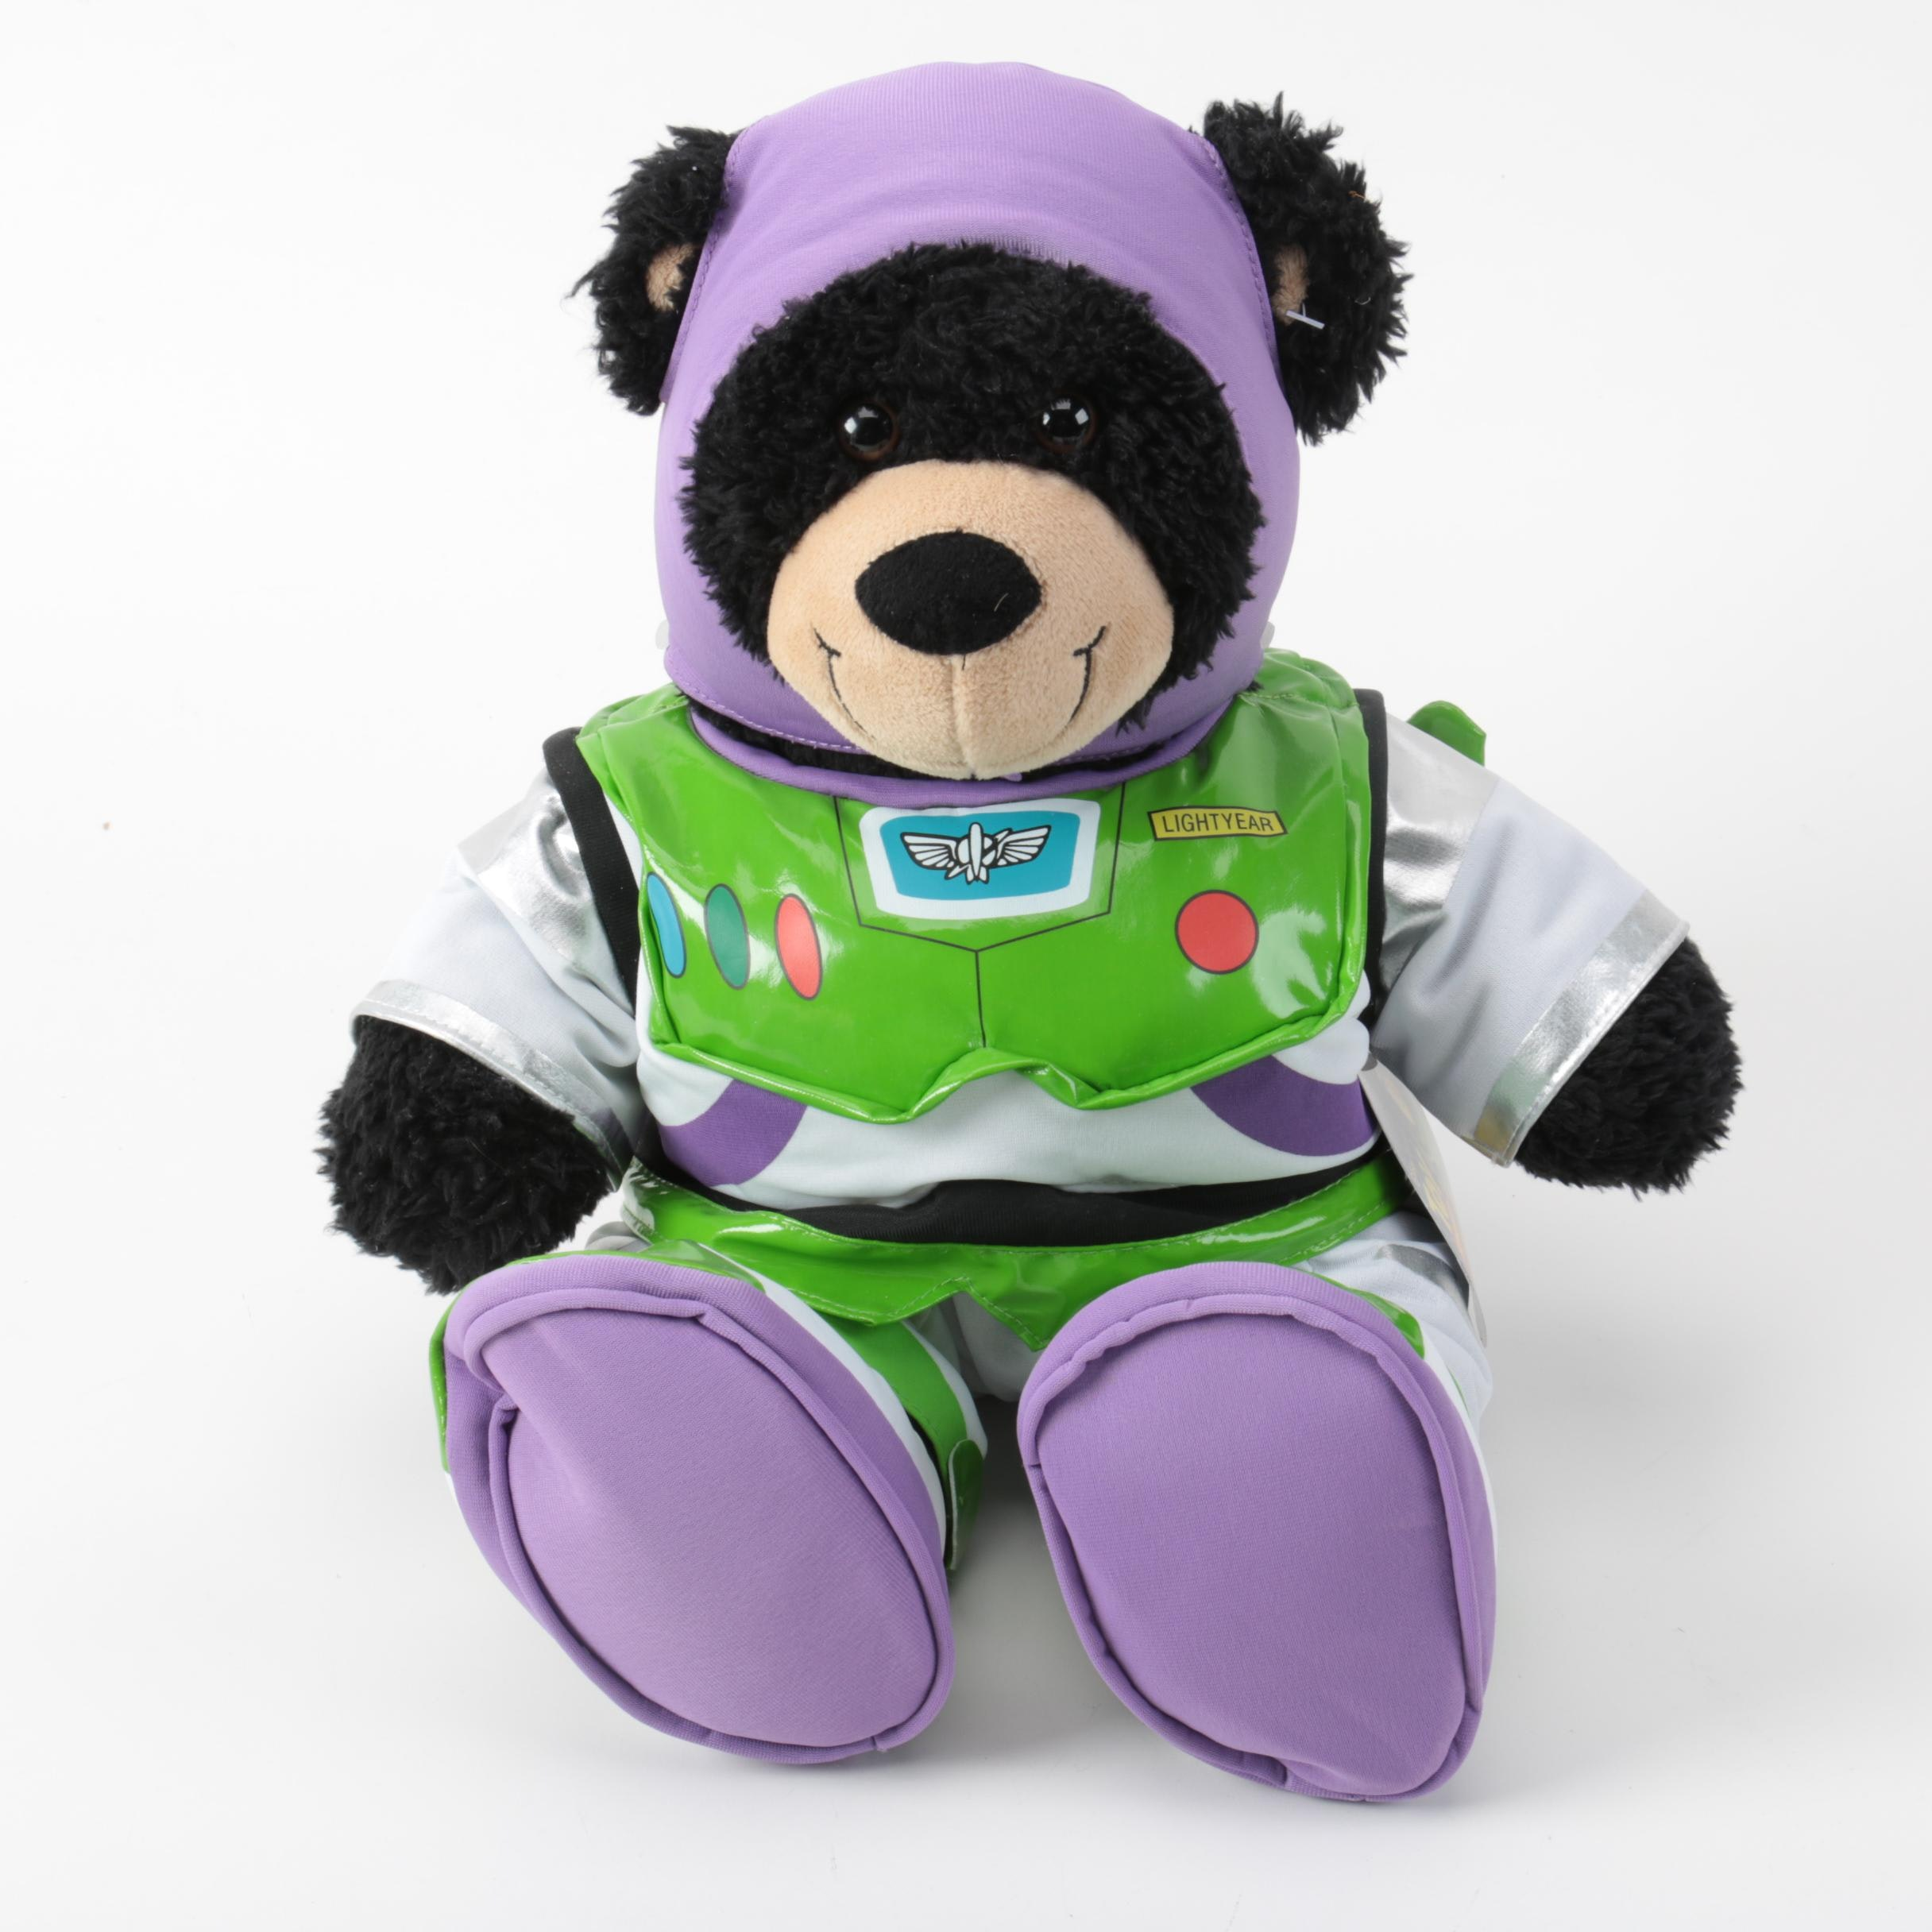 Buzz Lightyear Stuffed Bear by Build-A-Bear Workshop